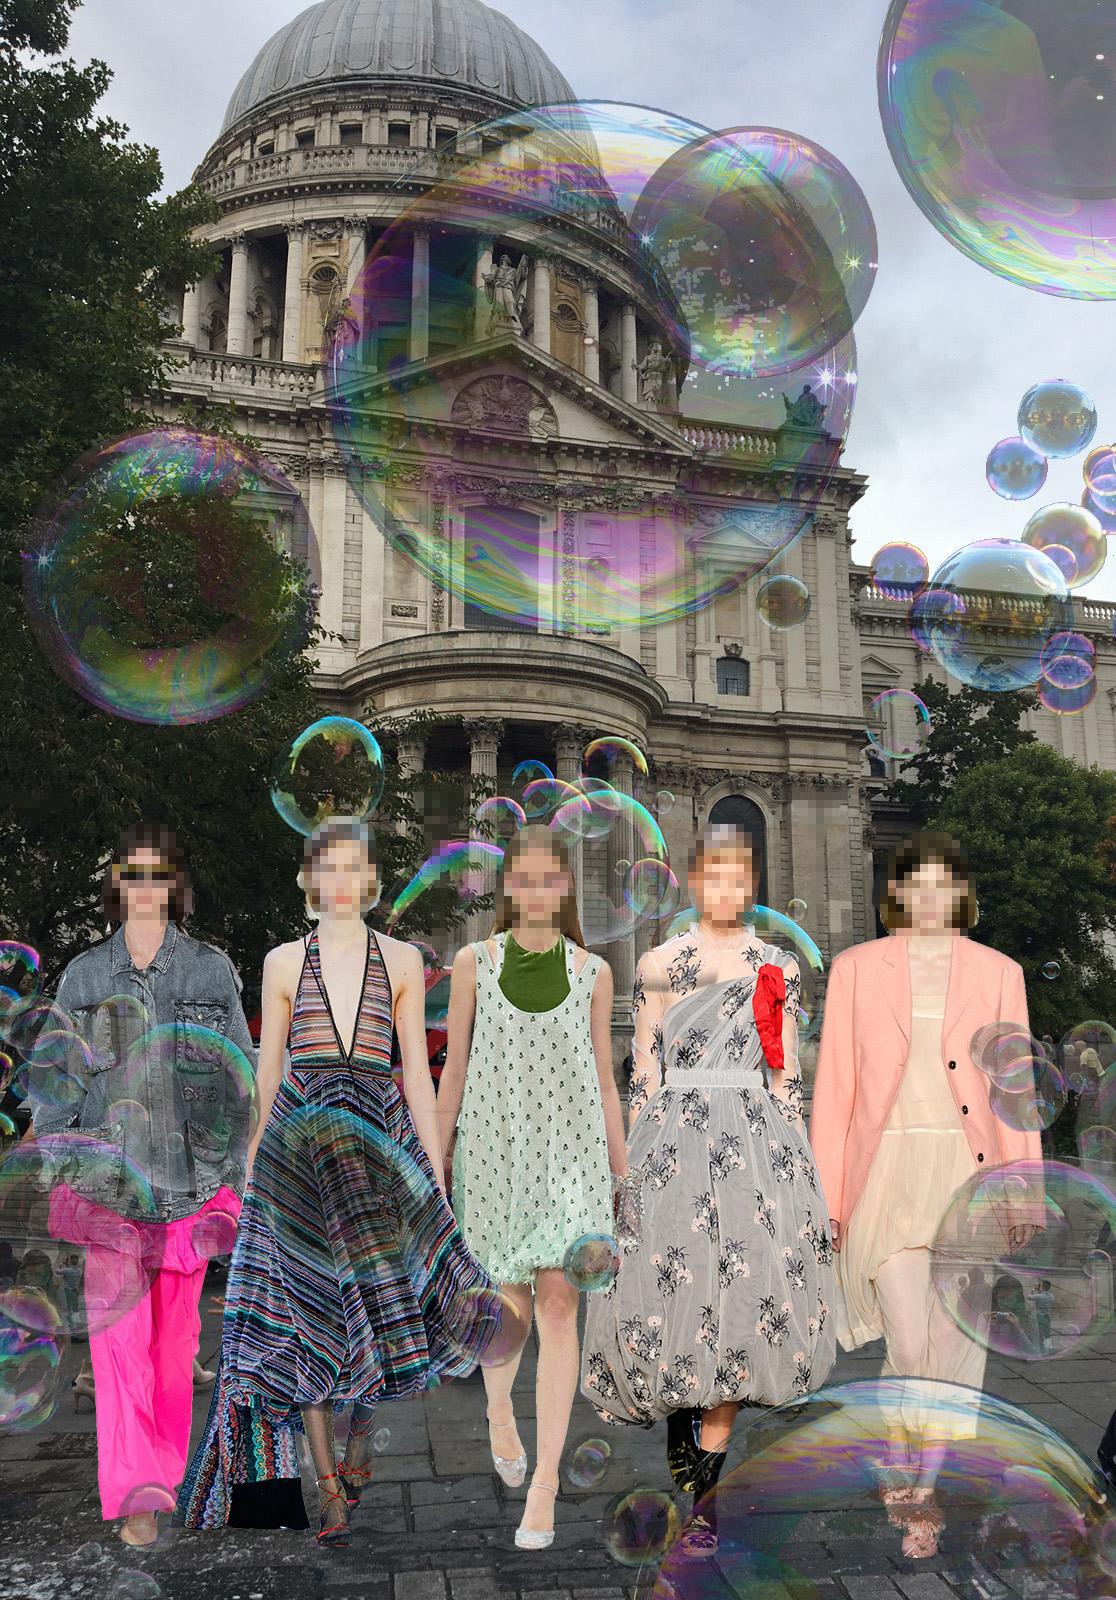 SS18-trend-bubble-skirt-3.jpg